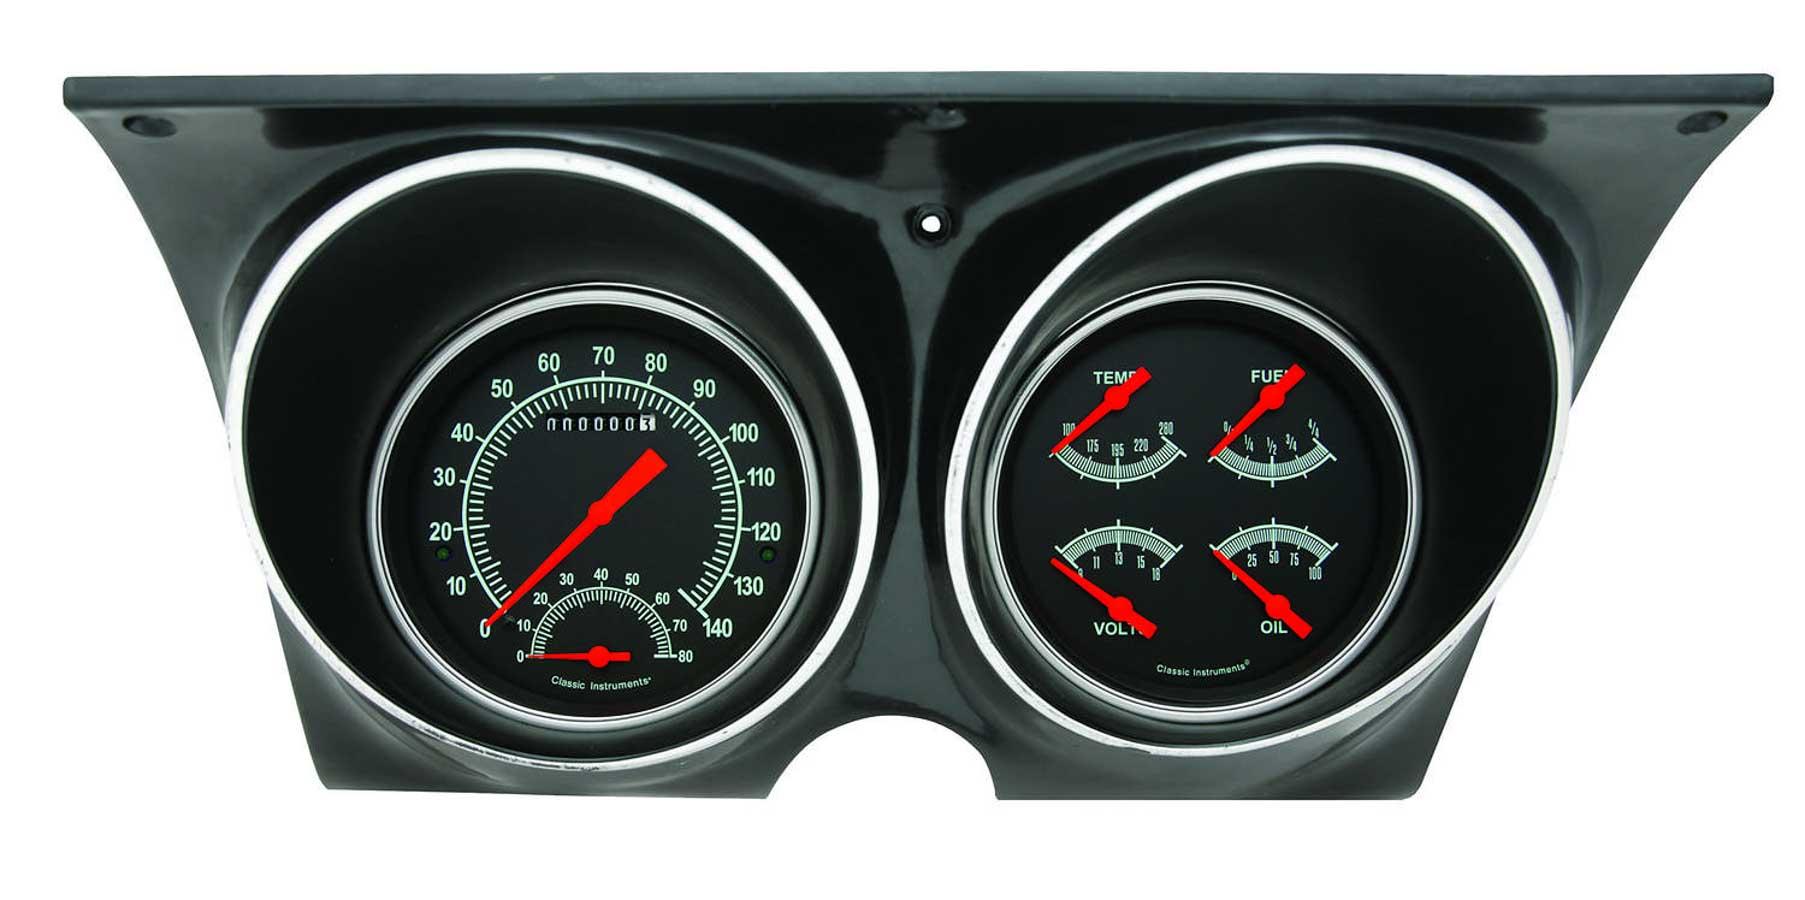 Grand Prix Auto 1968 Camaro Dash Instrument Cluster Circuit Board With Tachometer 67 68 Gauge G Stock Series